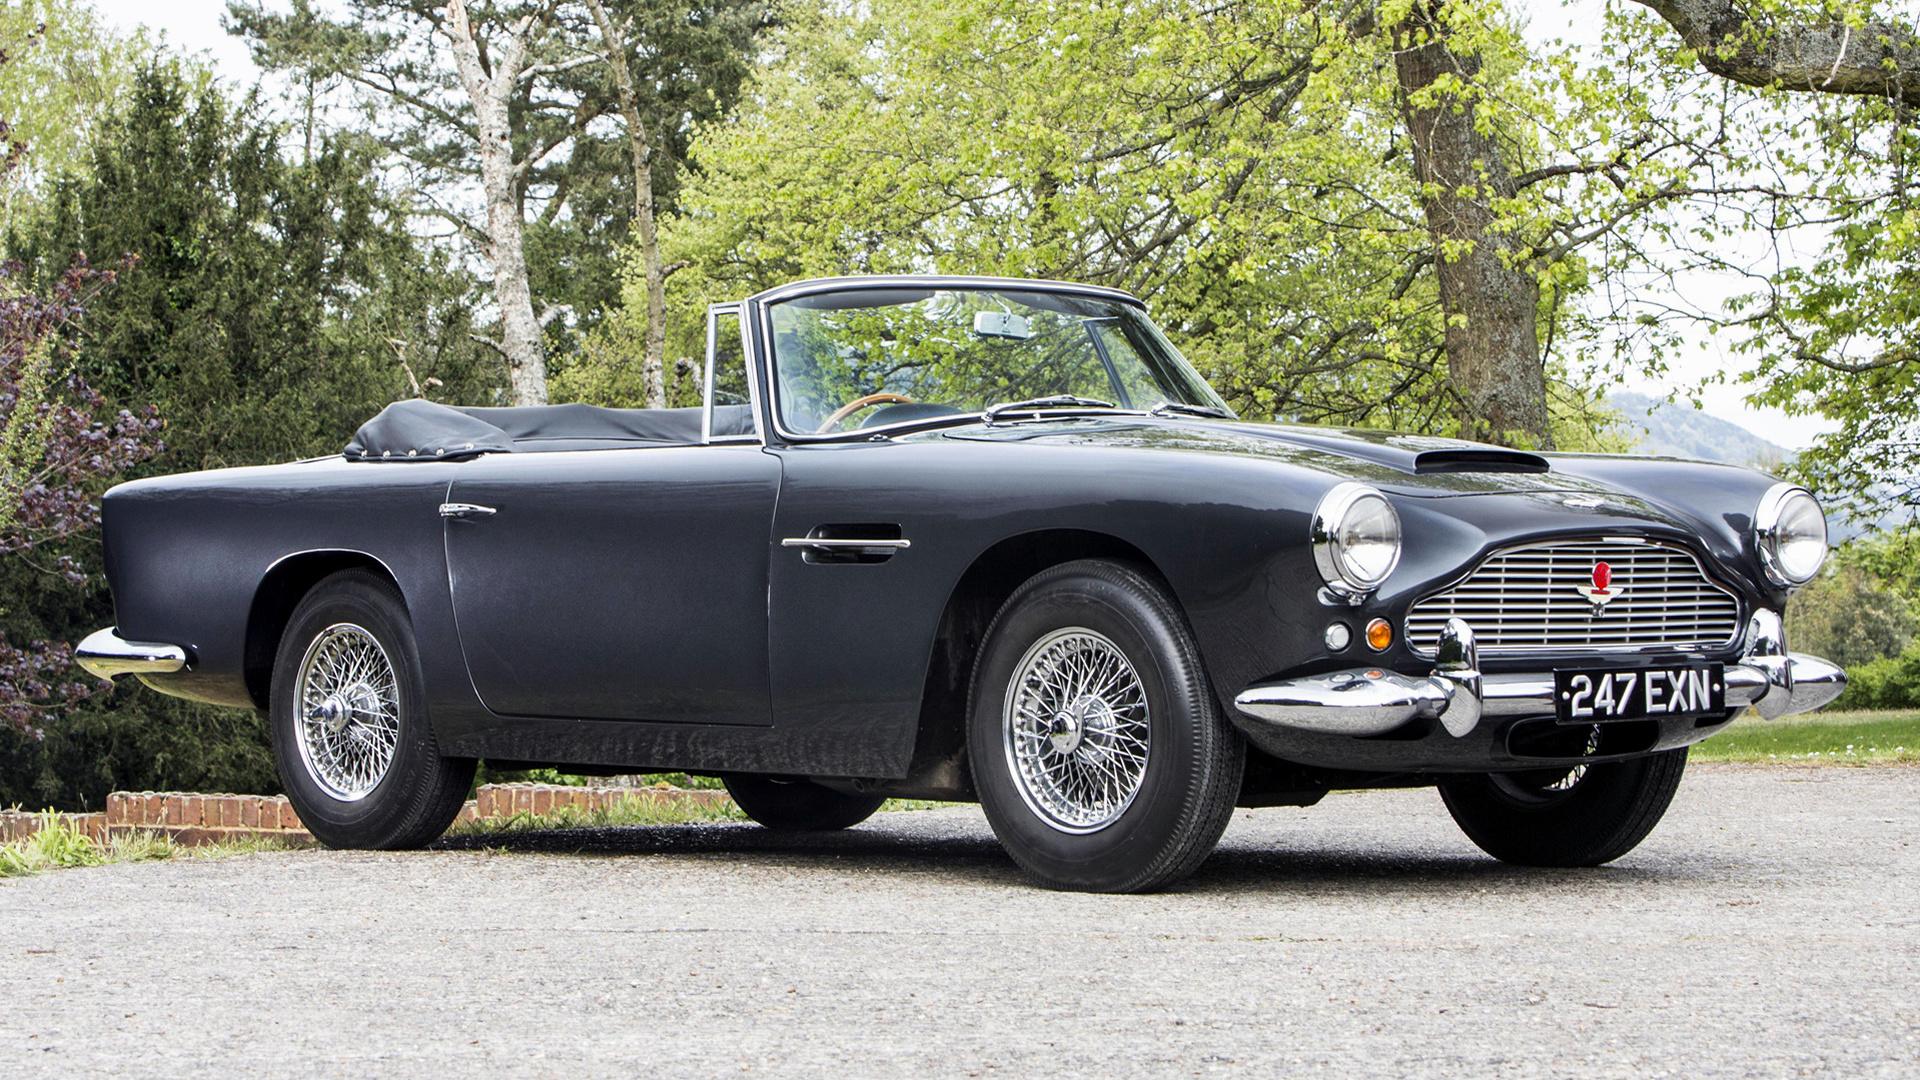 1961 Aston Martin Db4 Convertible Iv Uk Hintergrundbilder Und Wallpaper In Hd Car Pixel